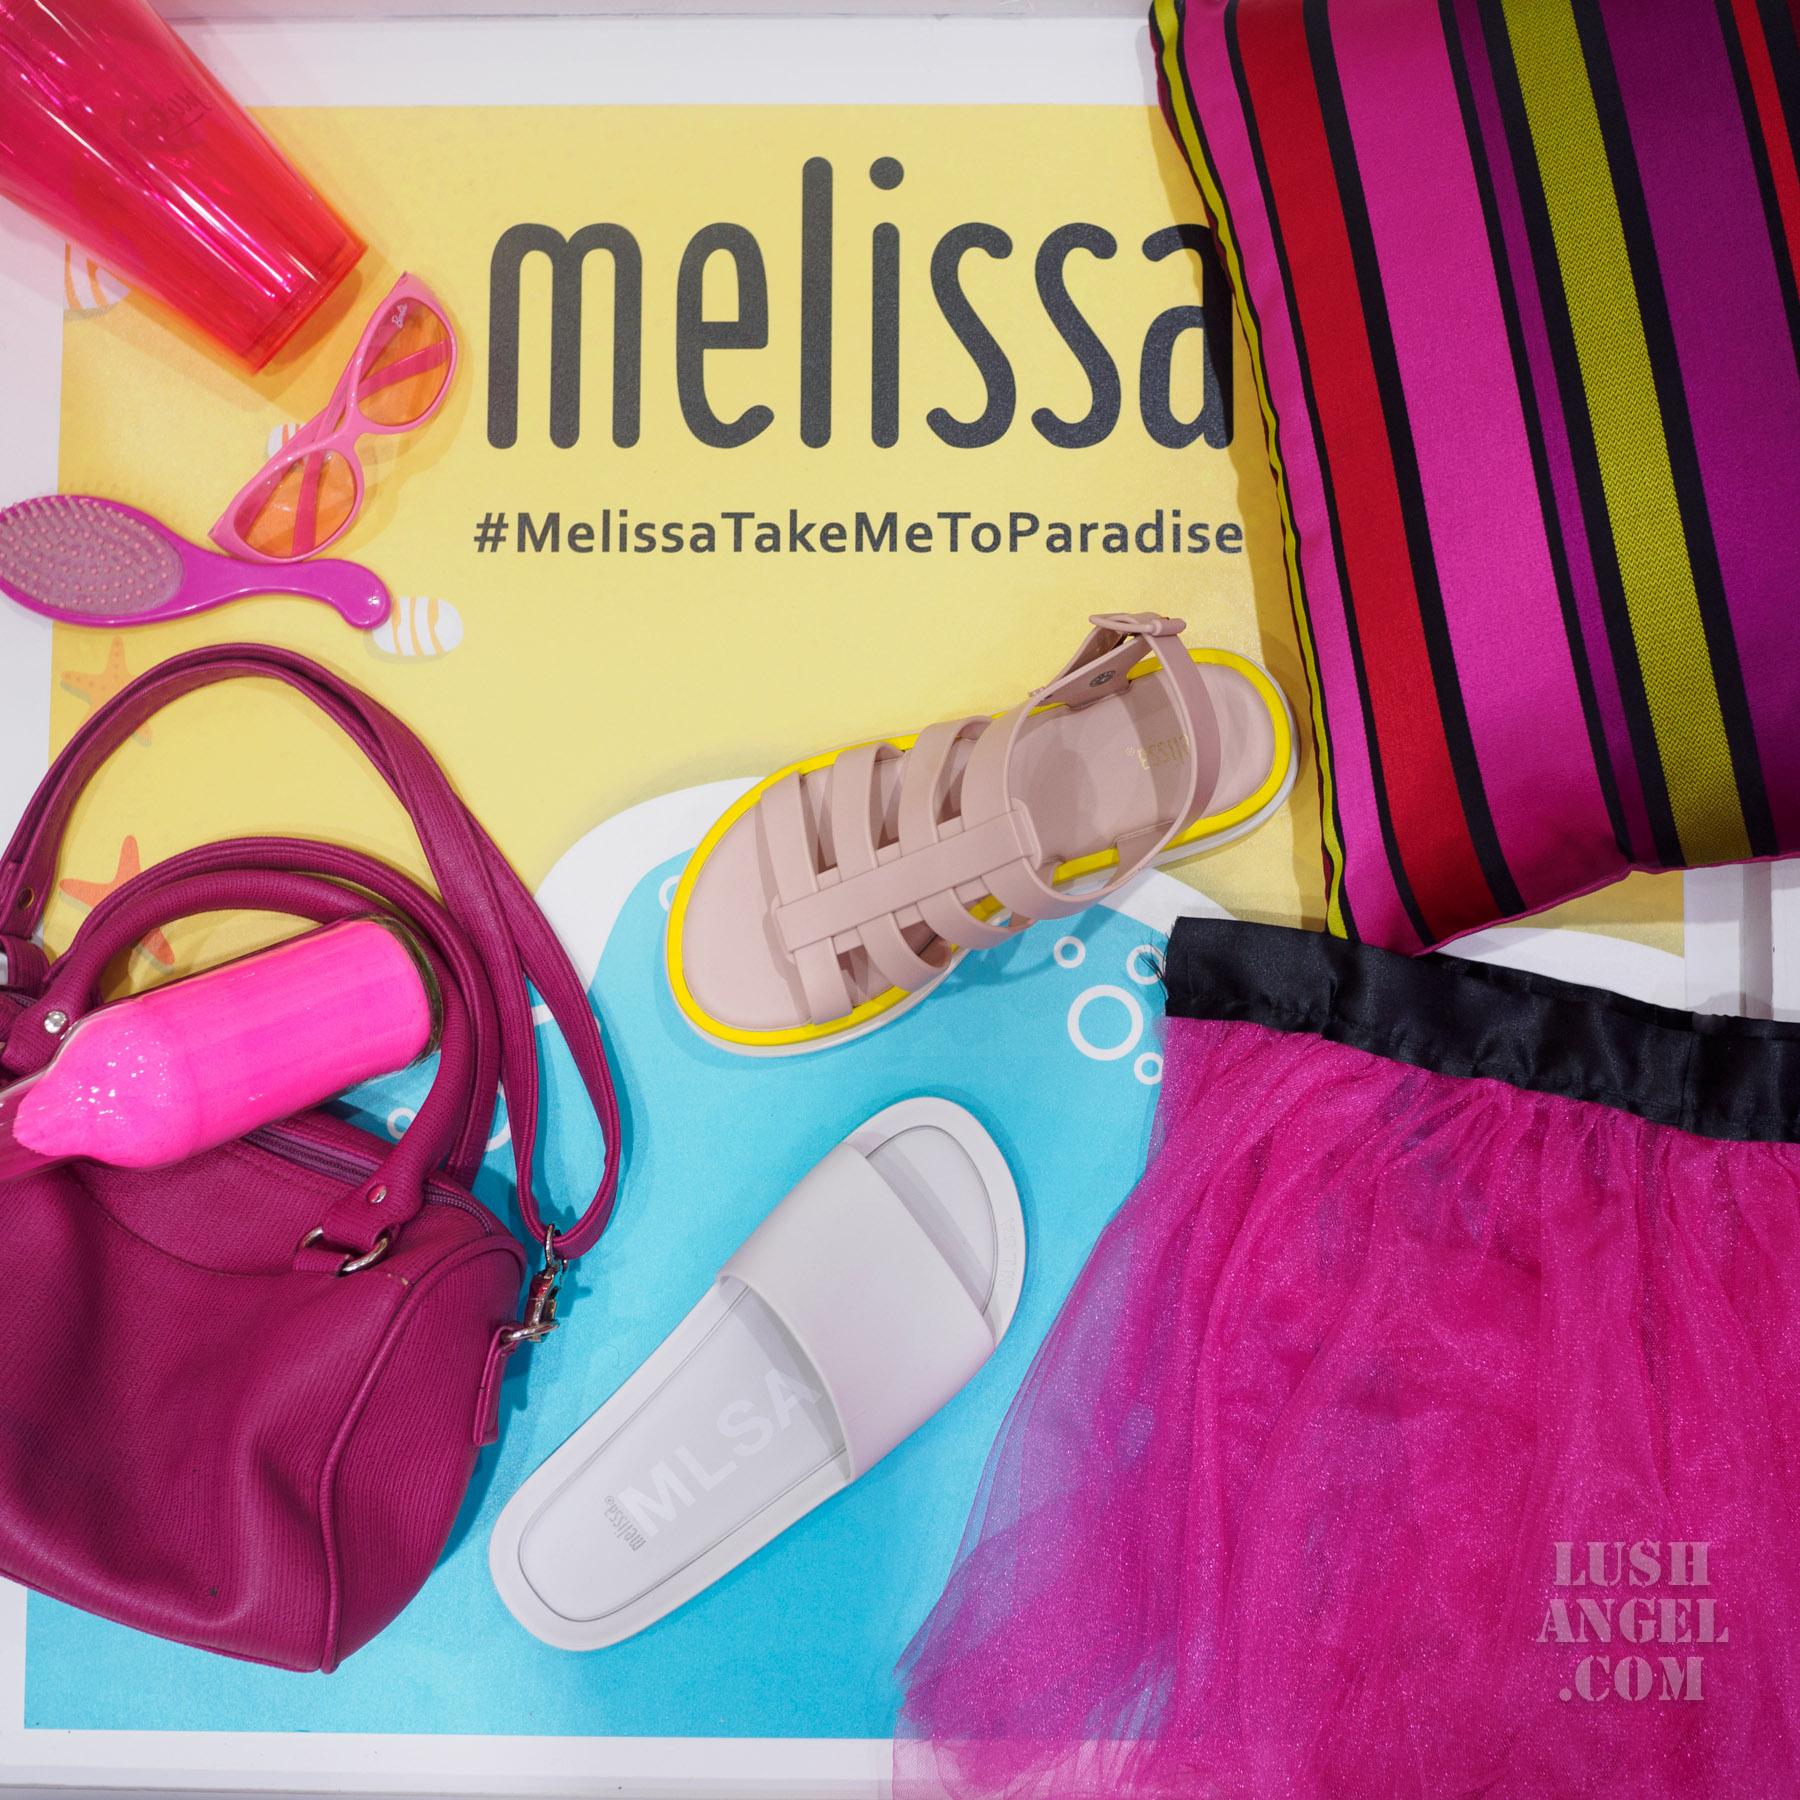 melissa-ph